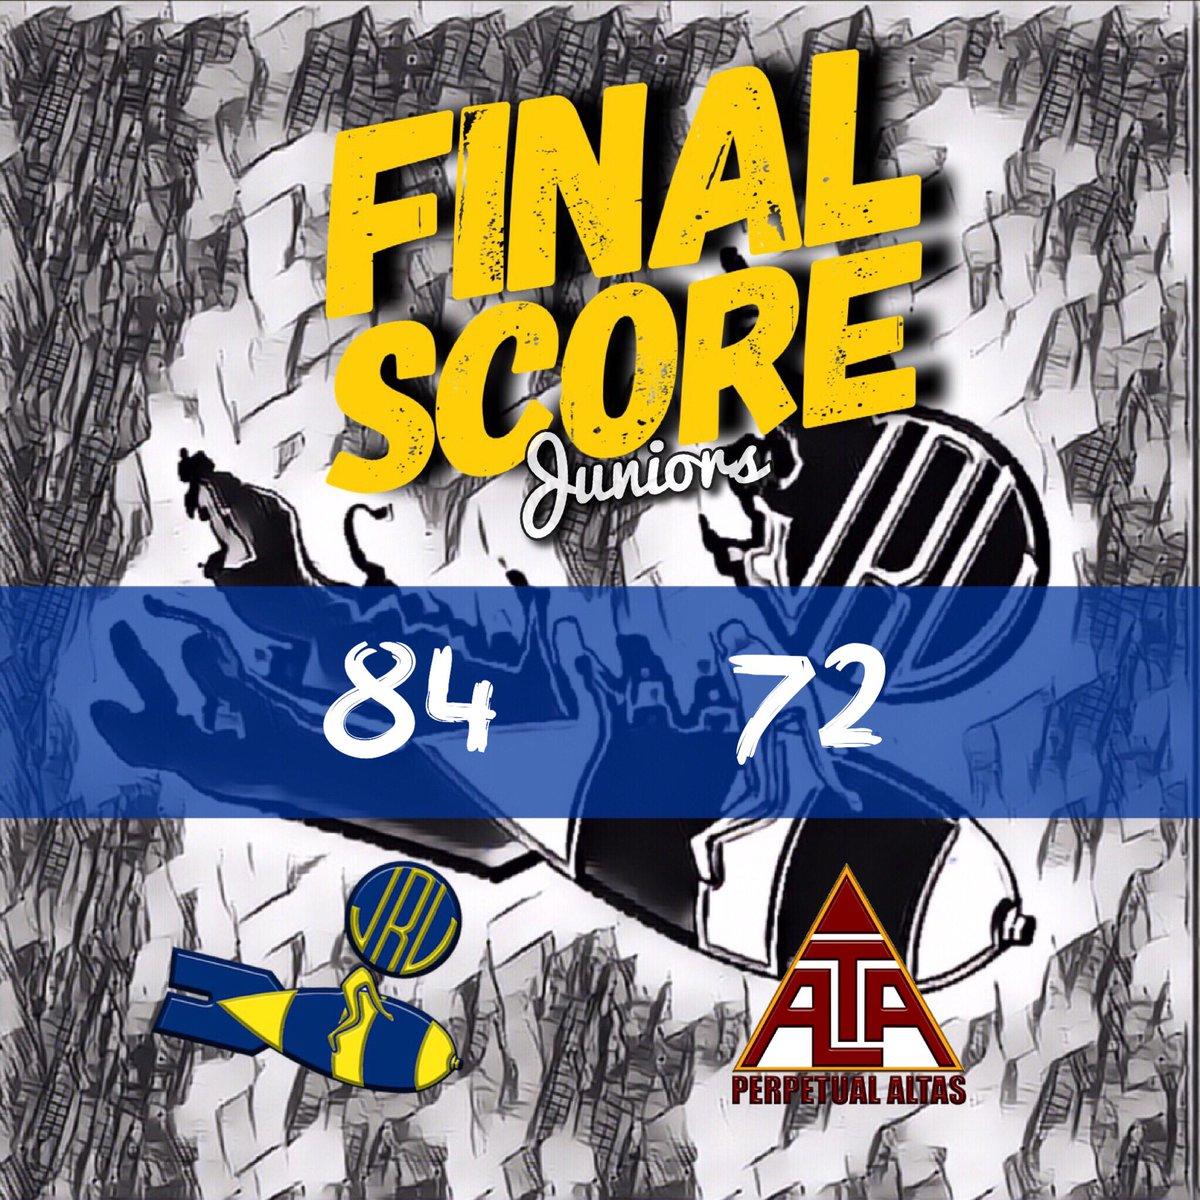 JRU Light Bombers dominated against UPHSD Junior Altas, 84-72.  #NCAASeason94 #MabuhayRizal #GalingJRU<br>http://pic.twitter.com/p3p2kfLDEN